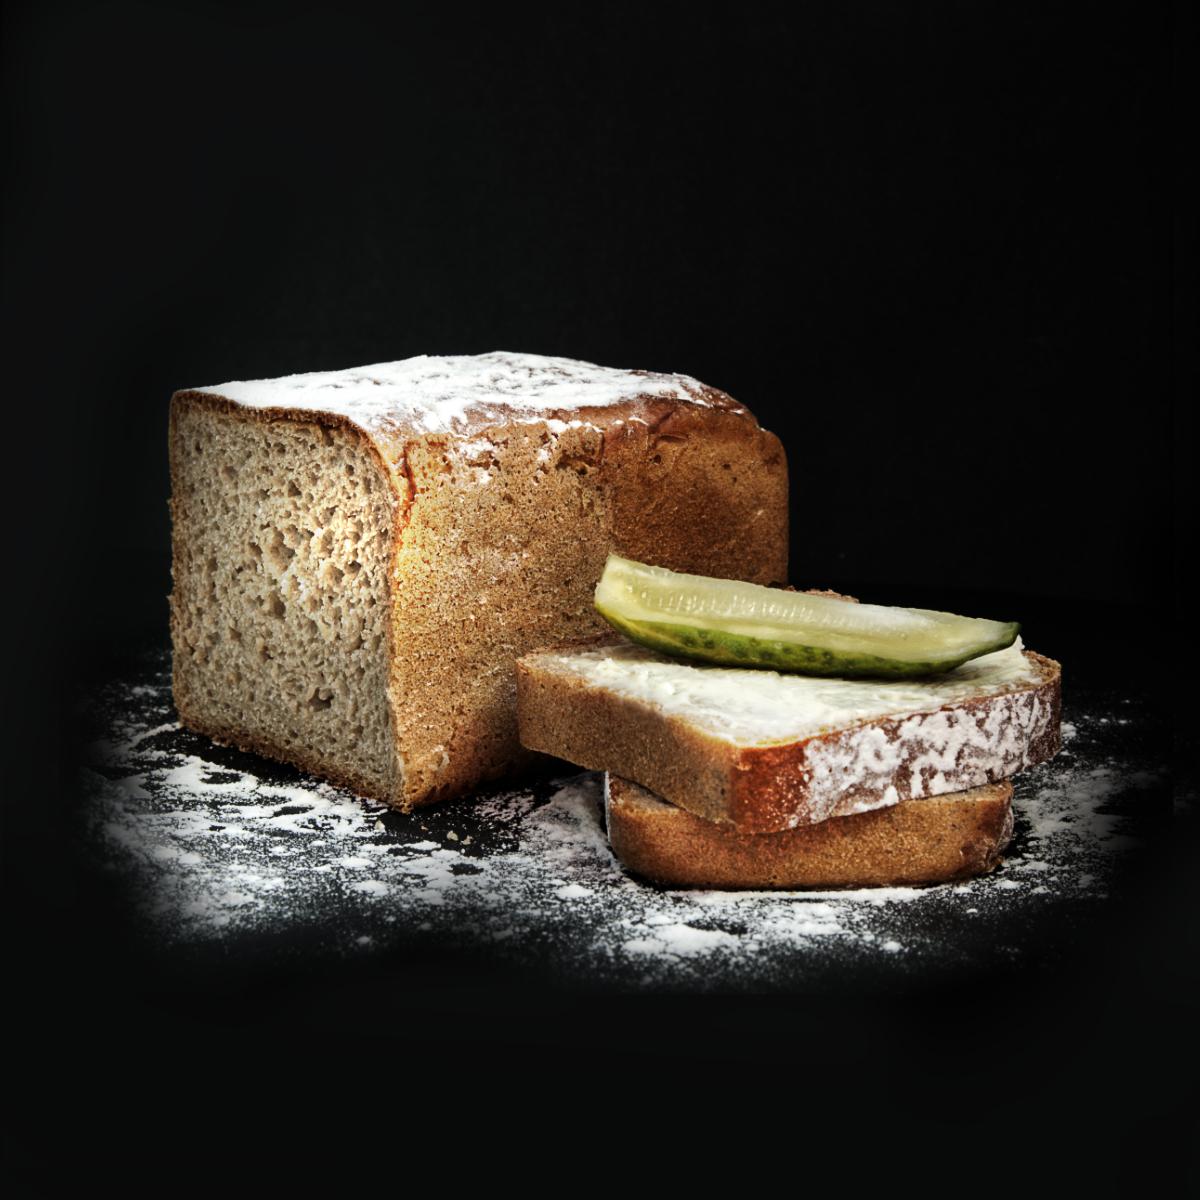 Chleb z ogórkiem